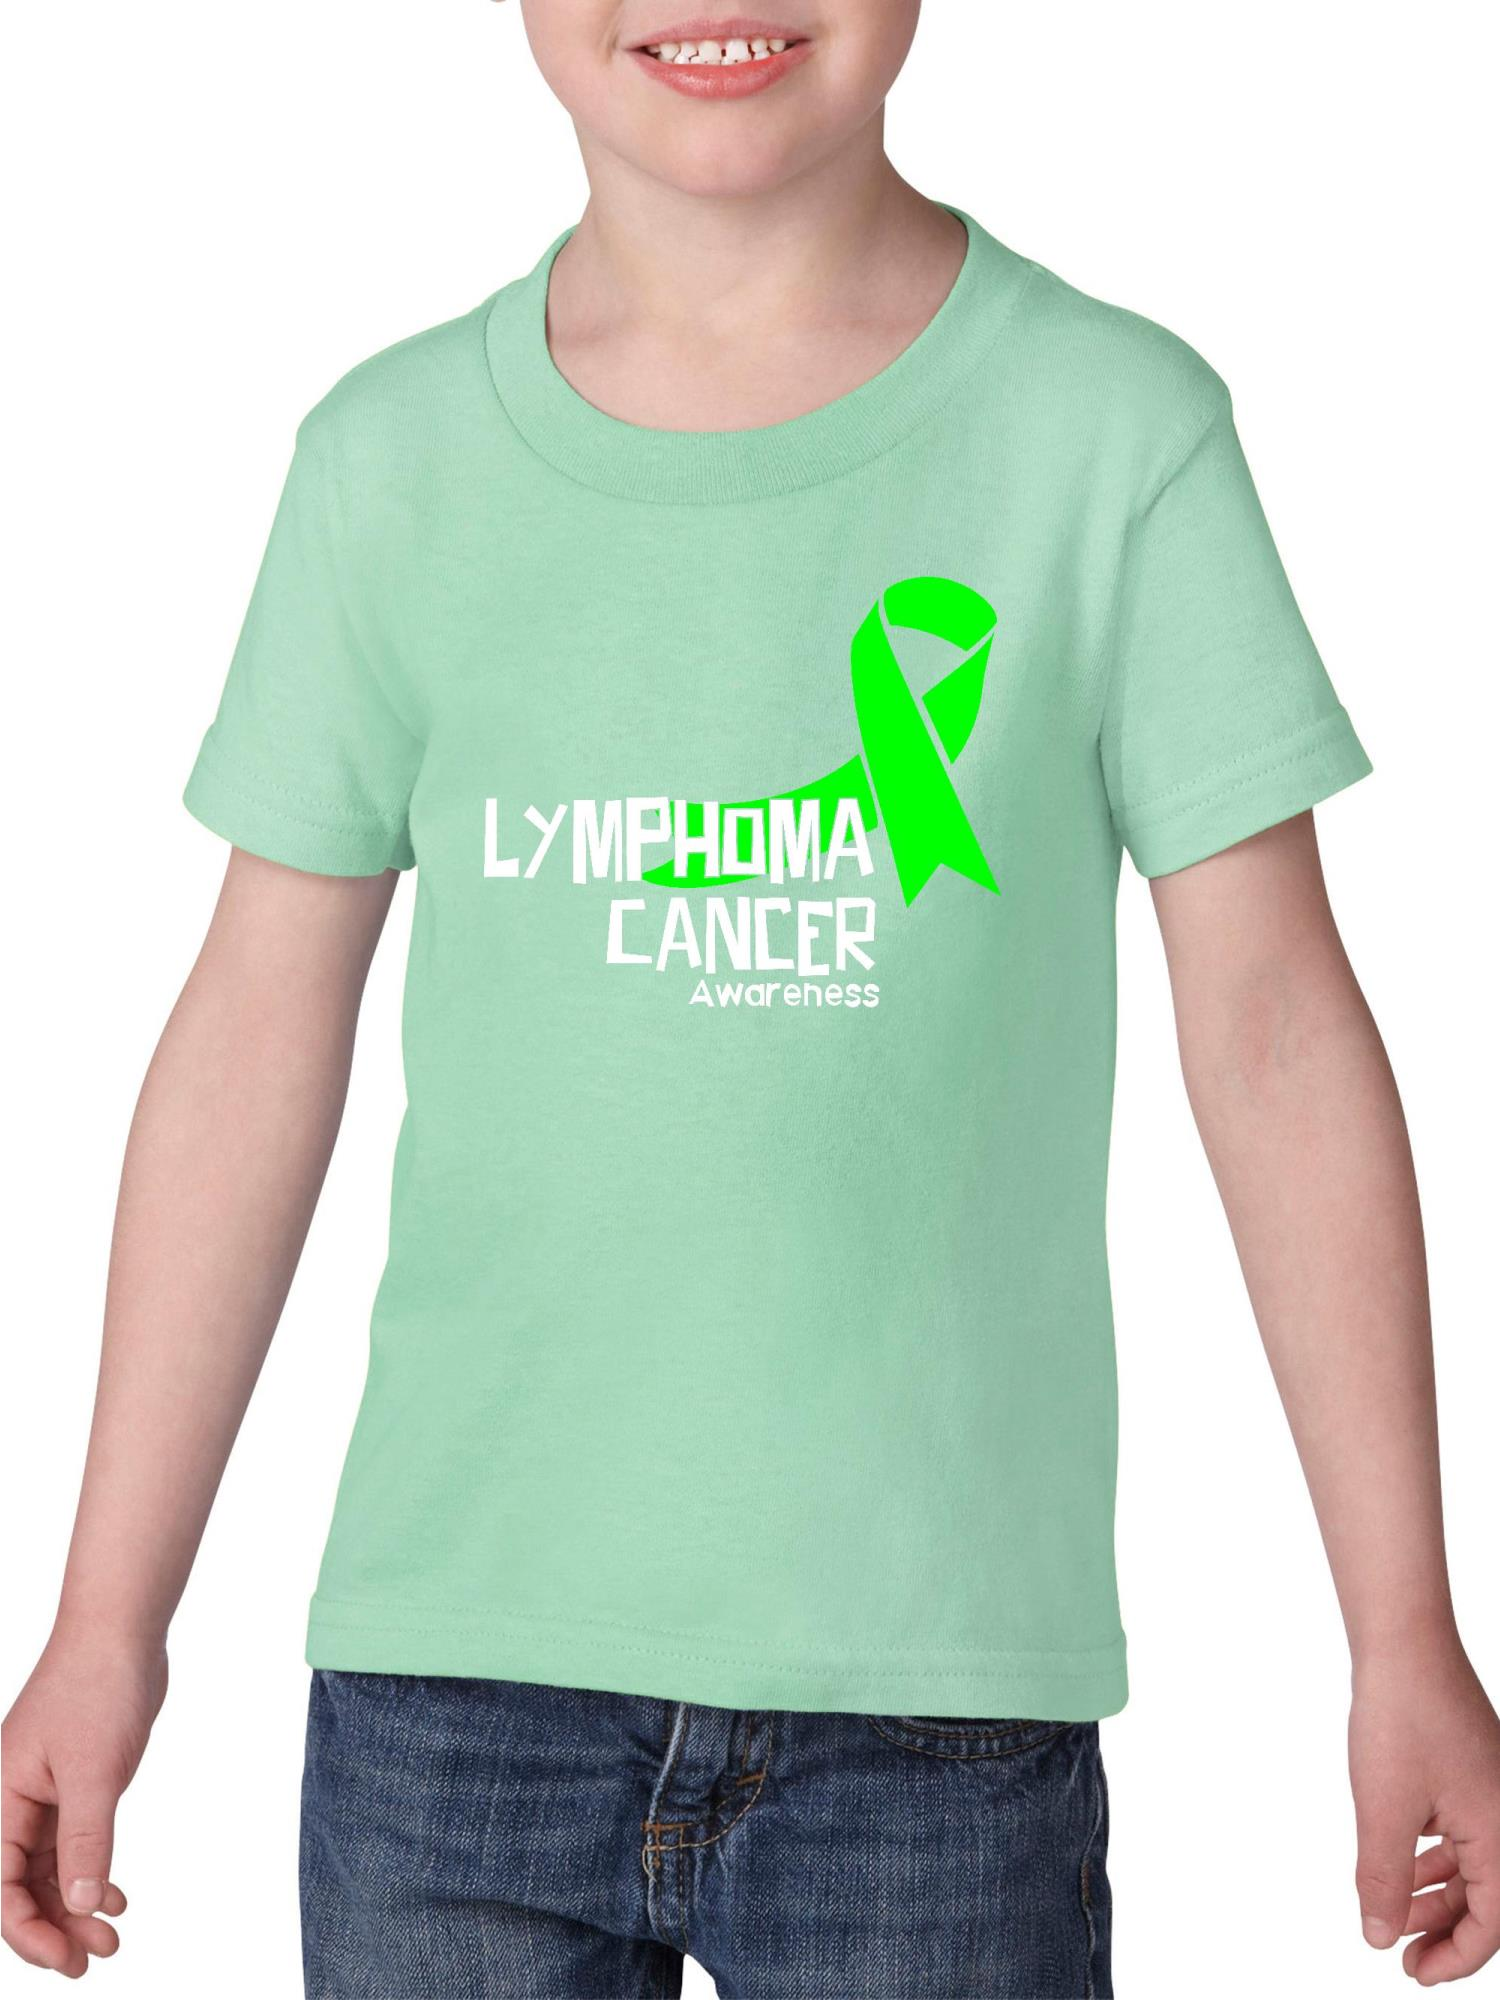 Lymphoma Cancer Awareness Heavy Cotton Toddler Kids T-Shirt Tee Clothing